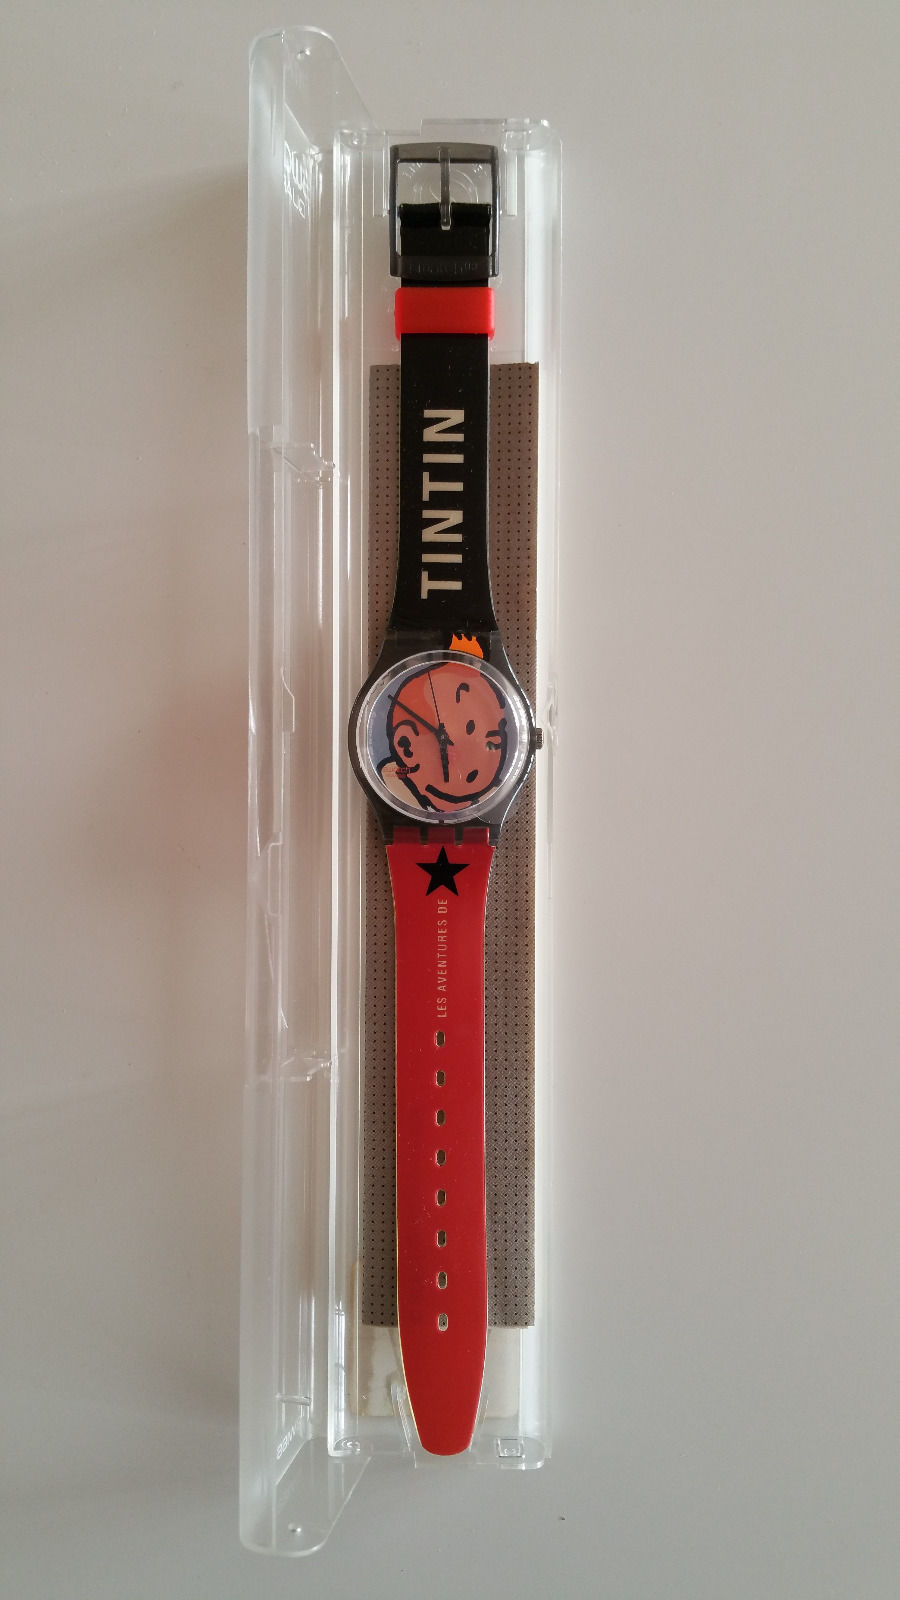 swatch tintin 130 euros.jpg